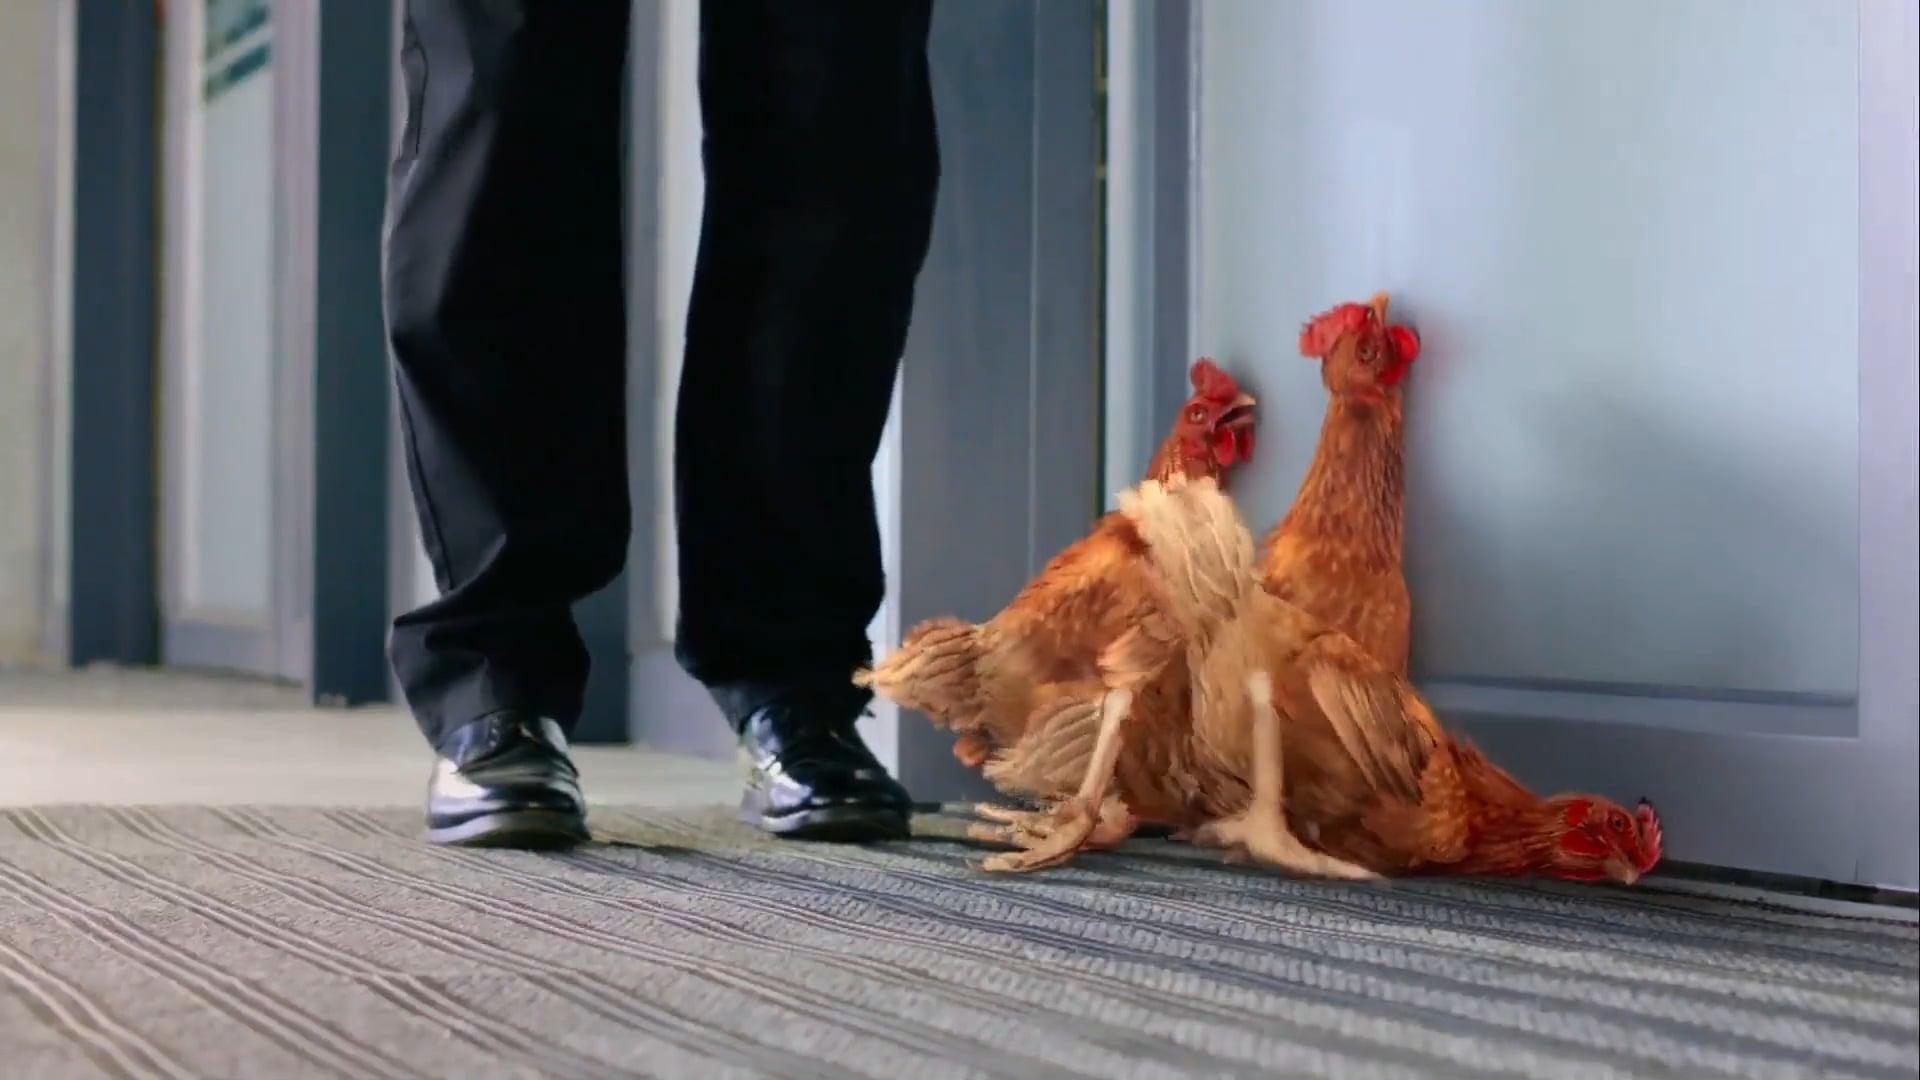 Paulo Henriques Migros Supermarket Chickens